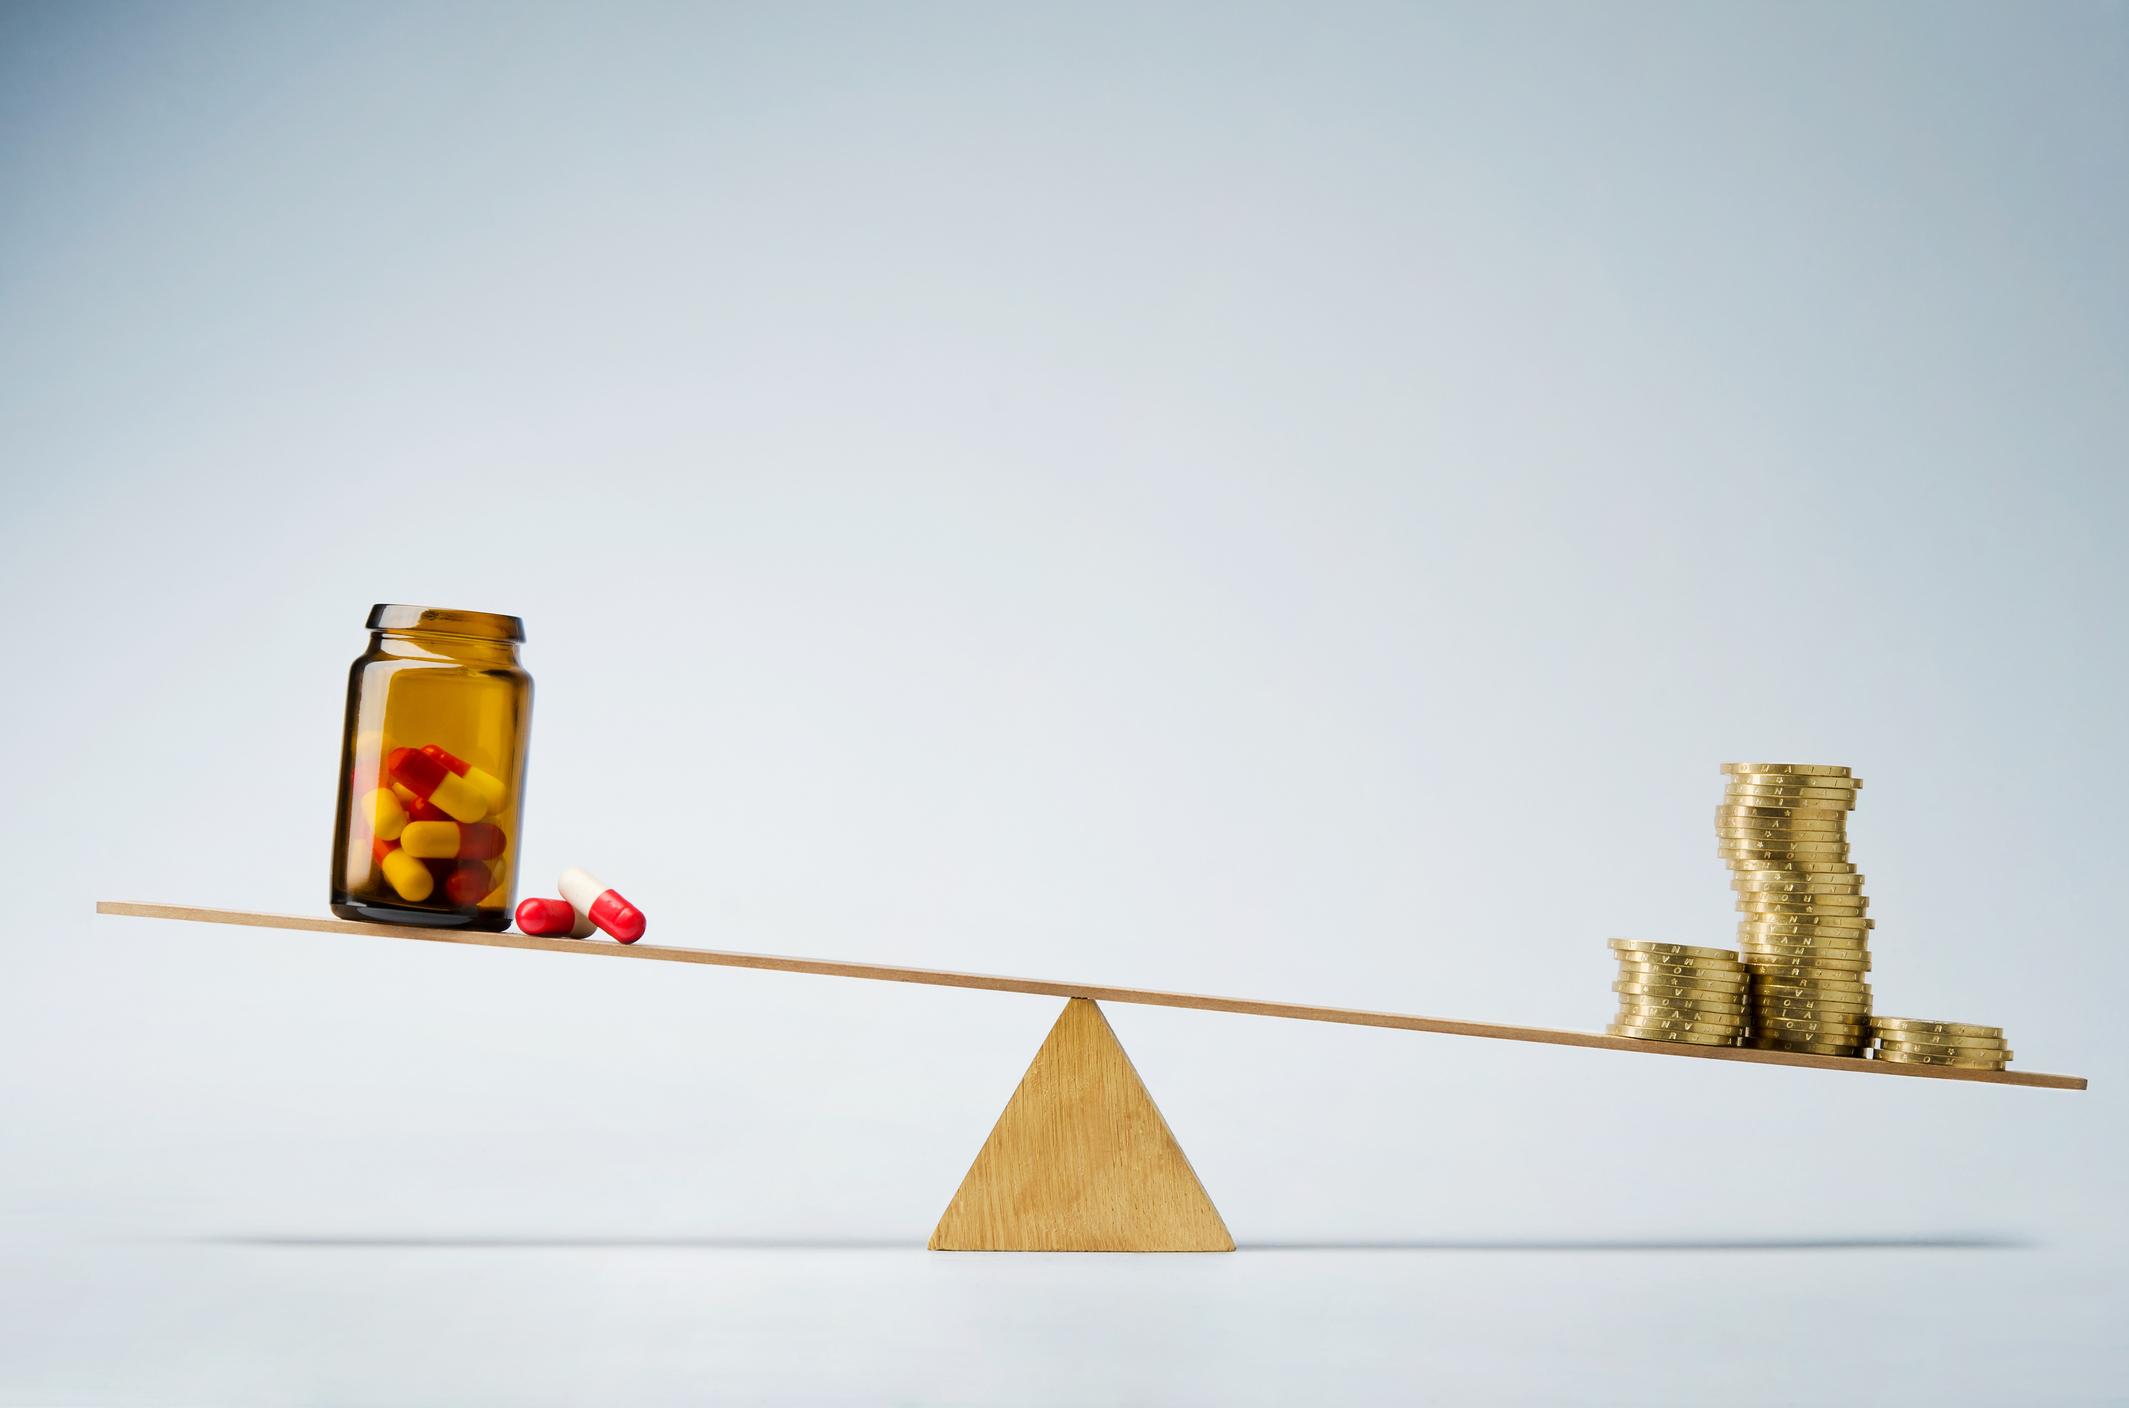 Pills and money on a balance beam